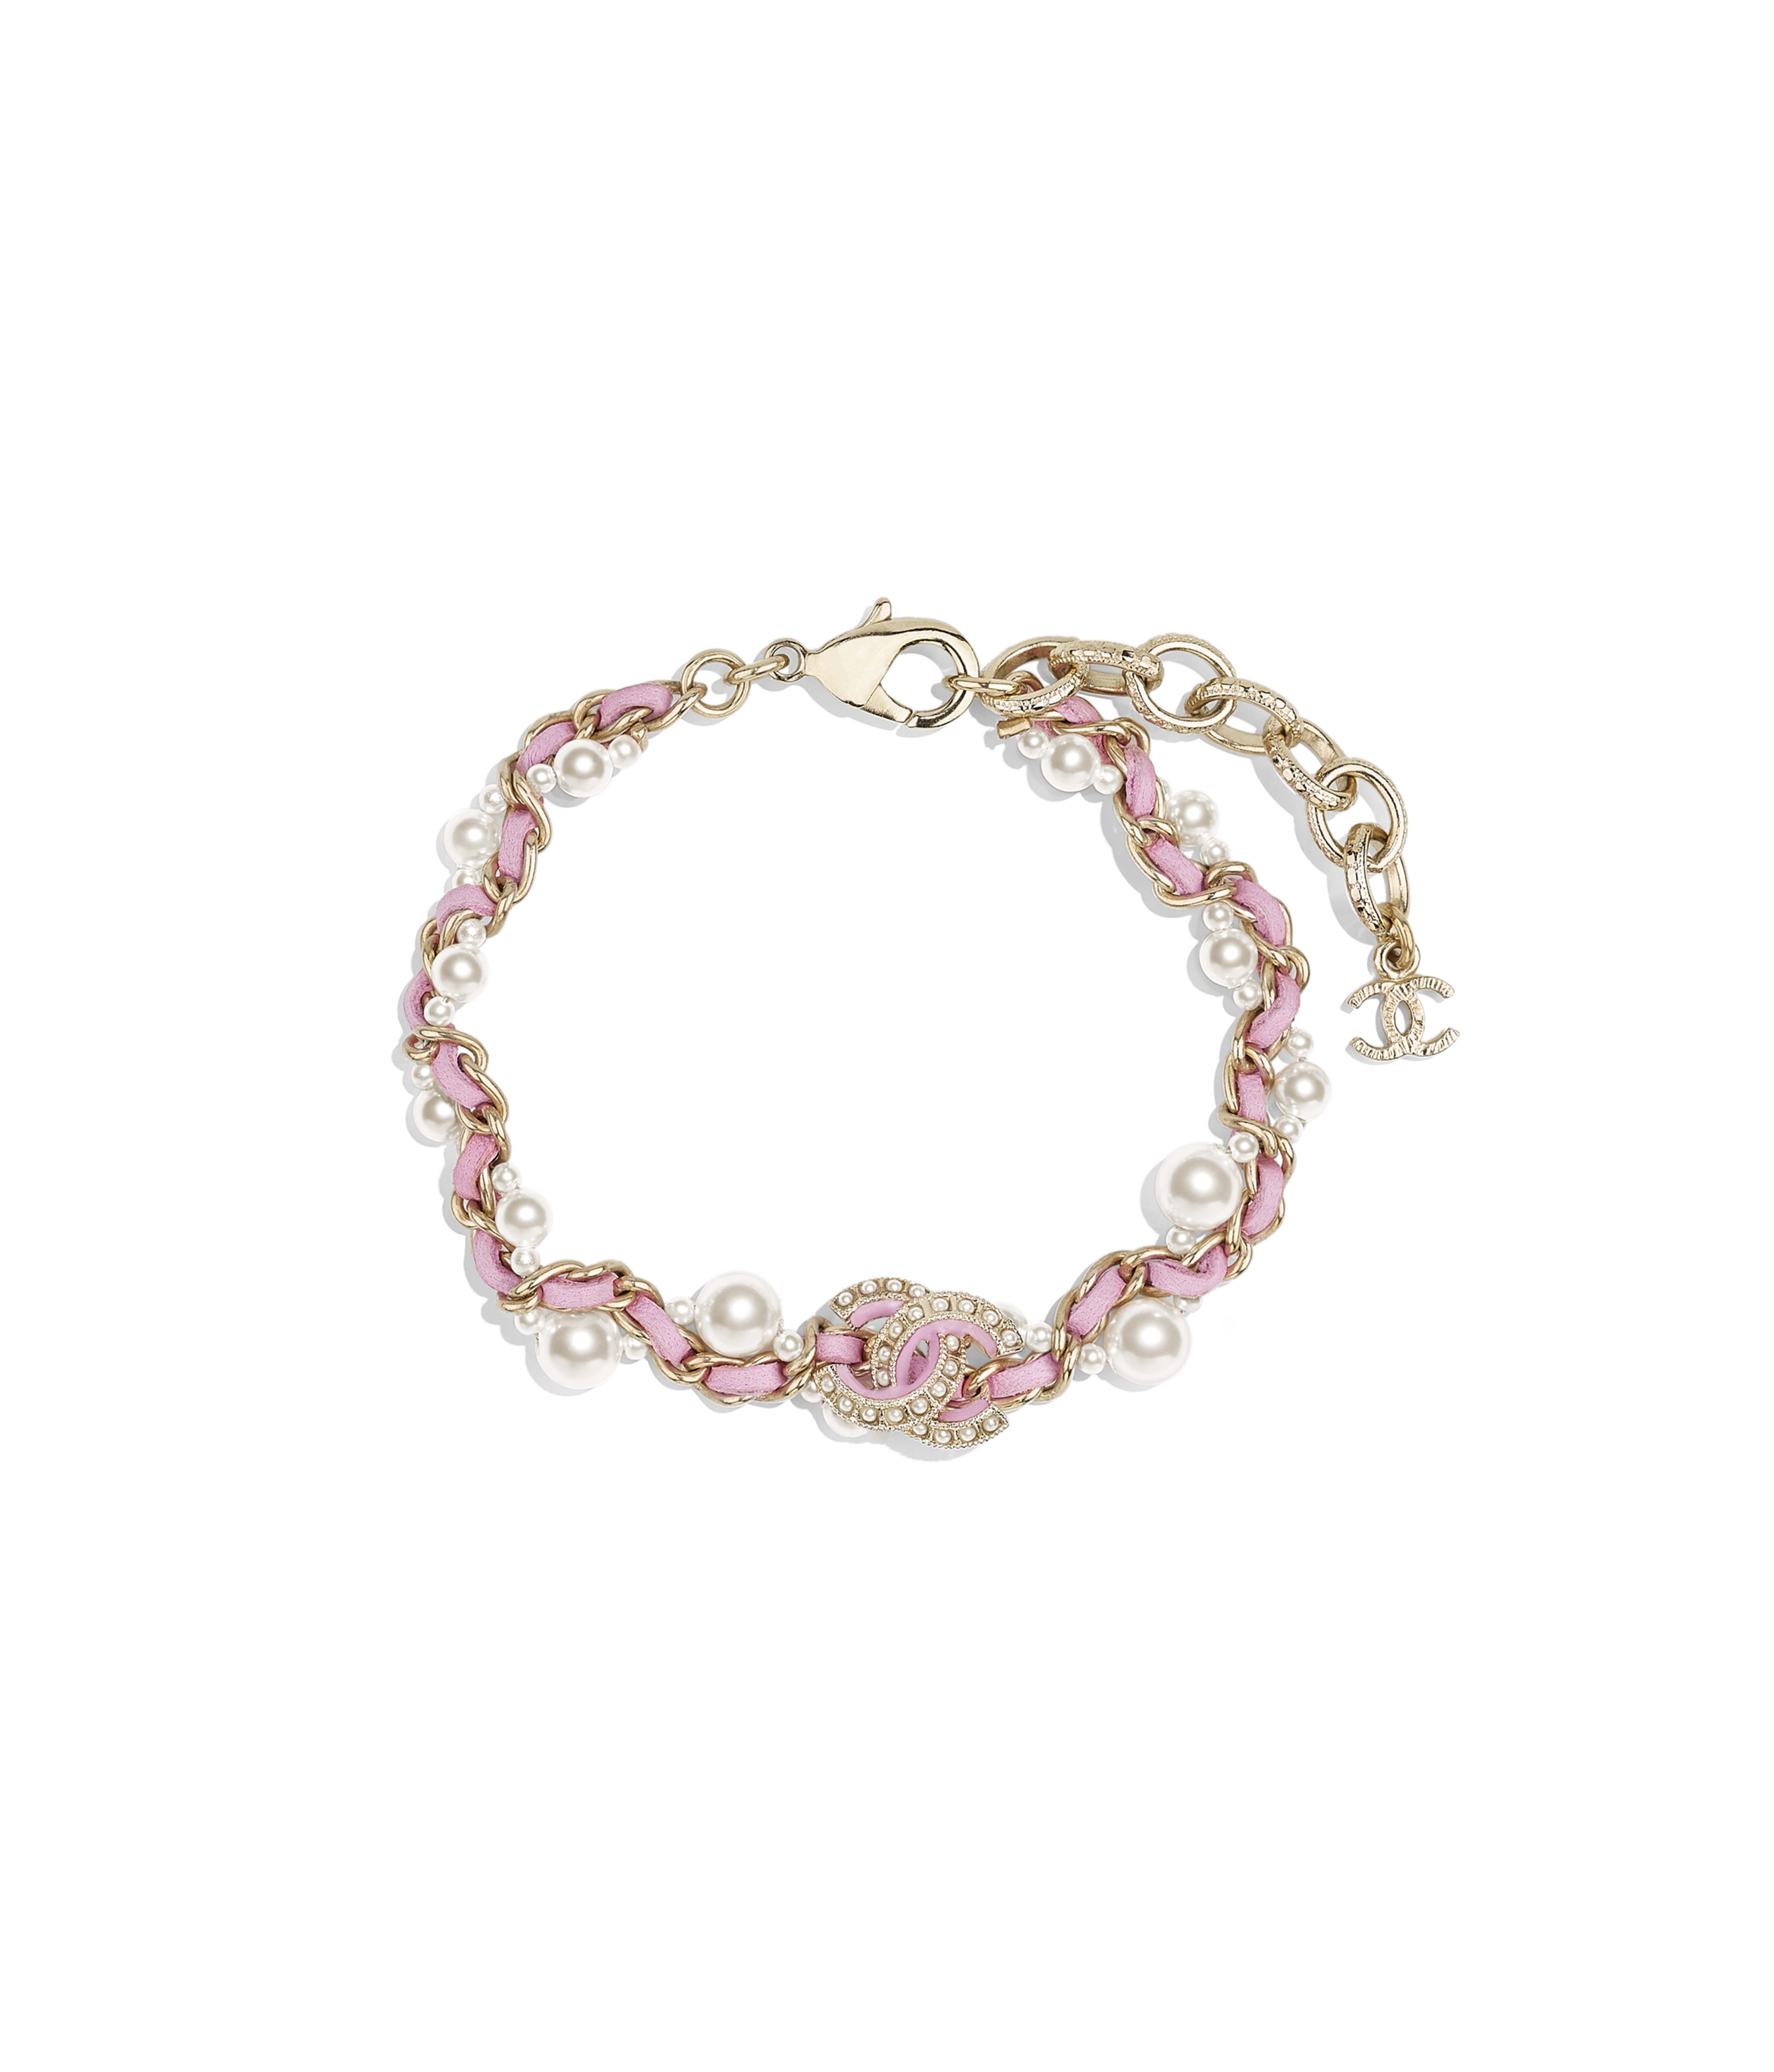 87a07a89618 Costume jewelry - Fashion